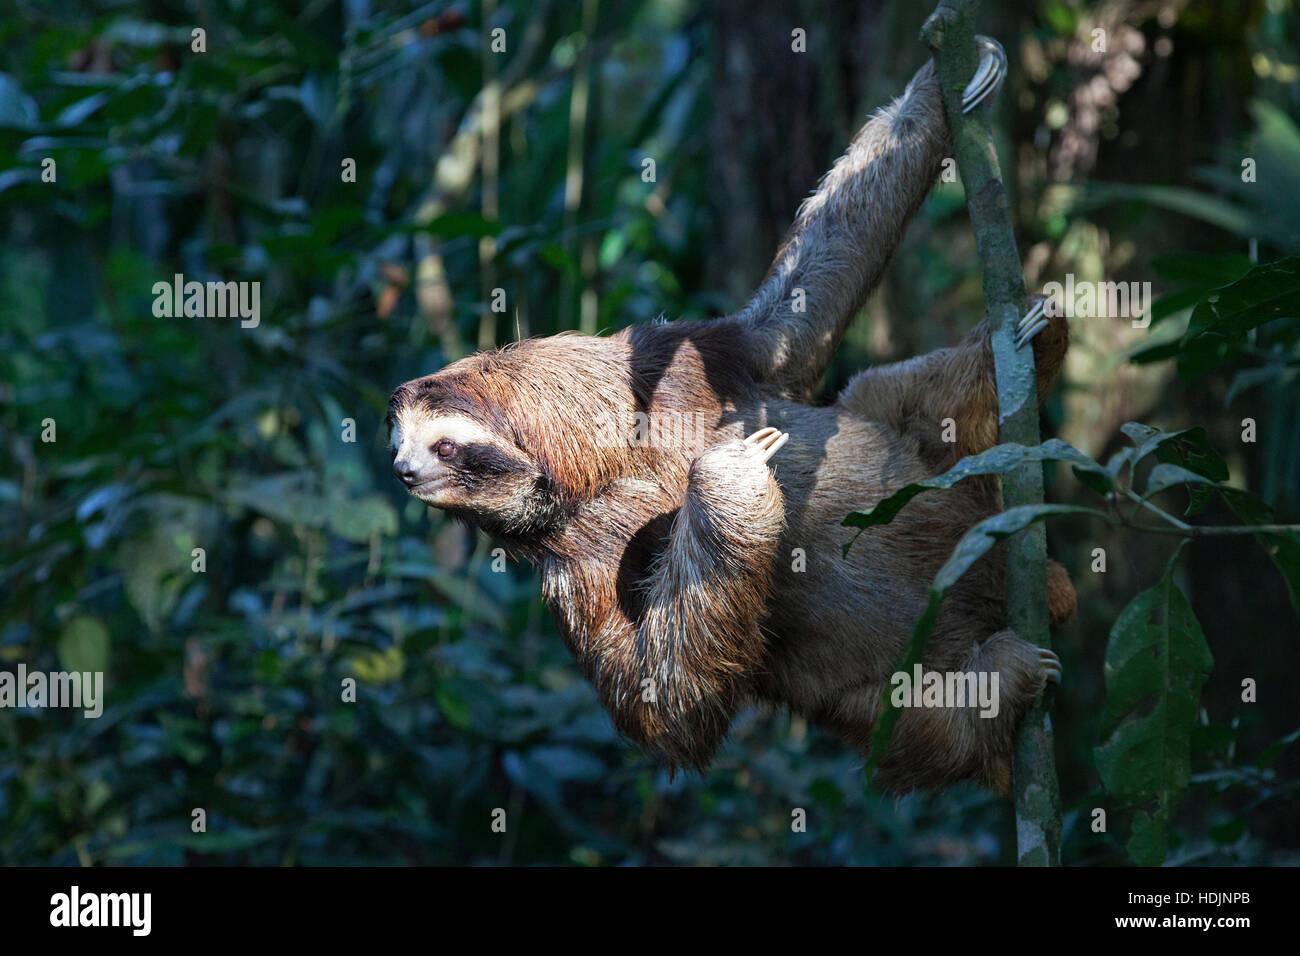 Brown-throated trois-toed Sloth (Bradypus variegatus) escalade arbre en sloth sanctuary Photo Stock